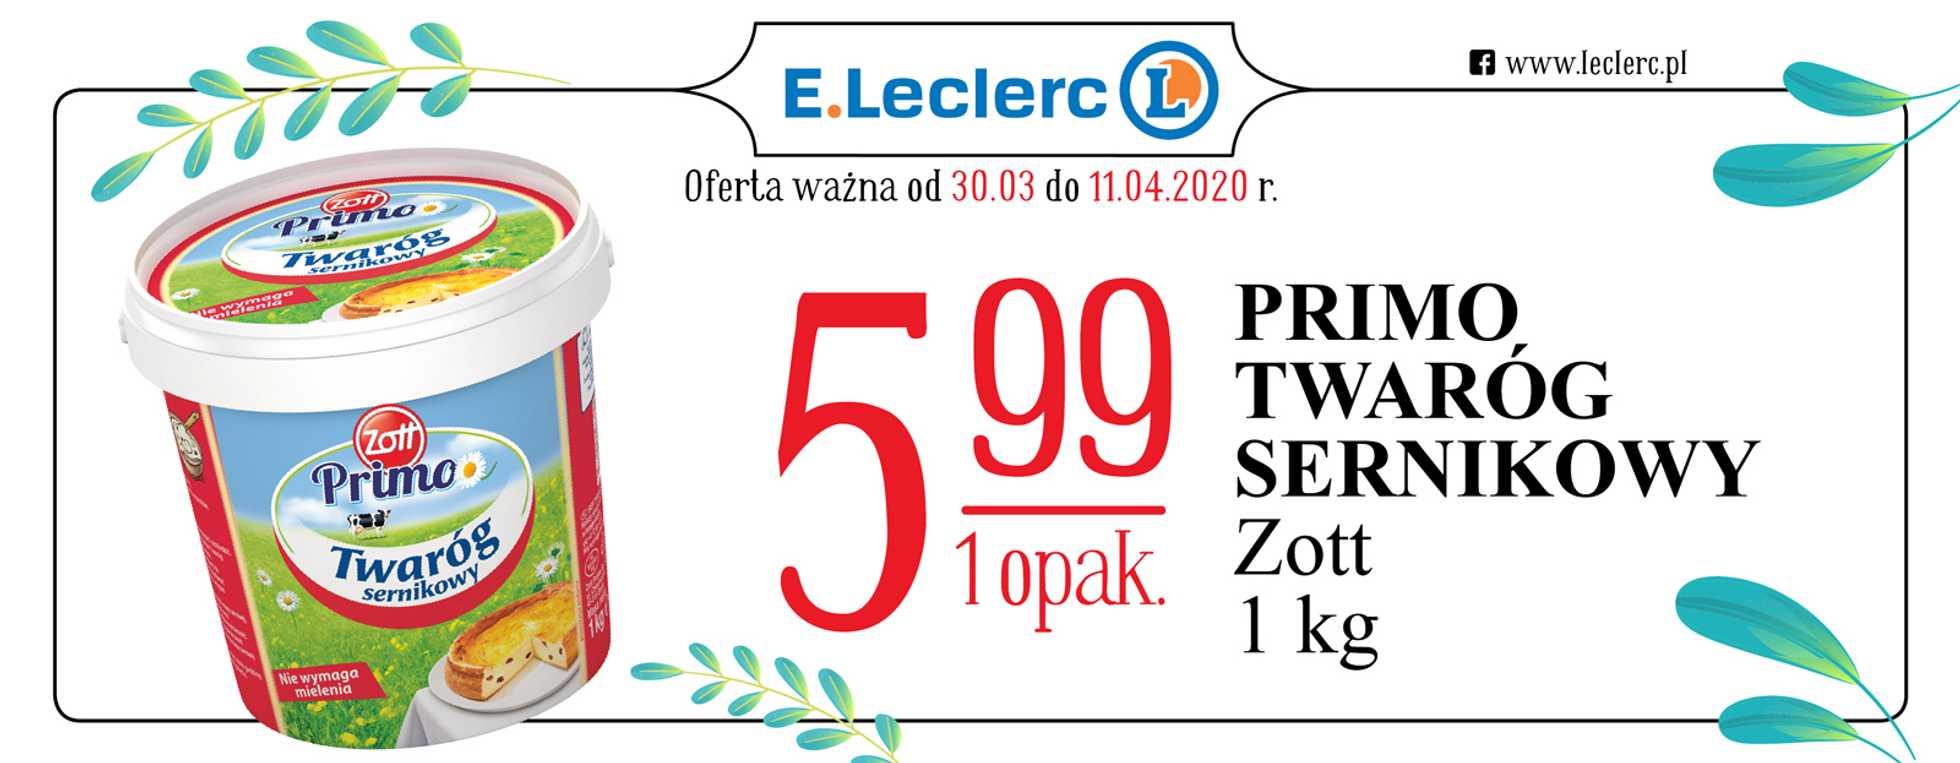 E.Leclerc - gazetka promocyjna ważna od 30.03.2020 do 11.04.2020 - strona 2.